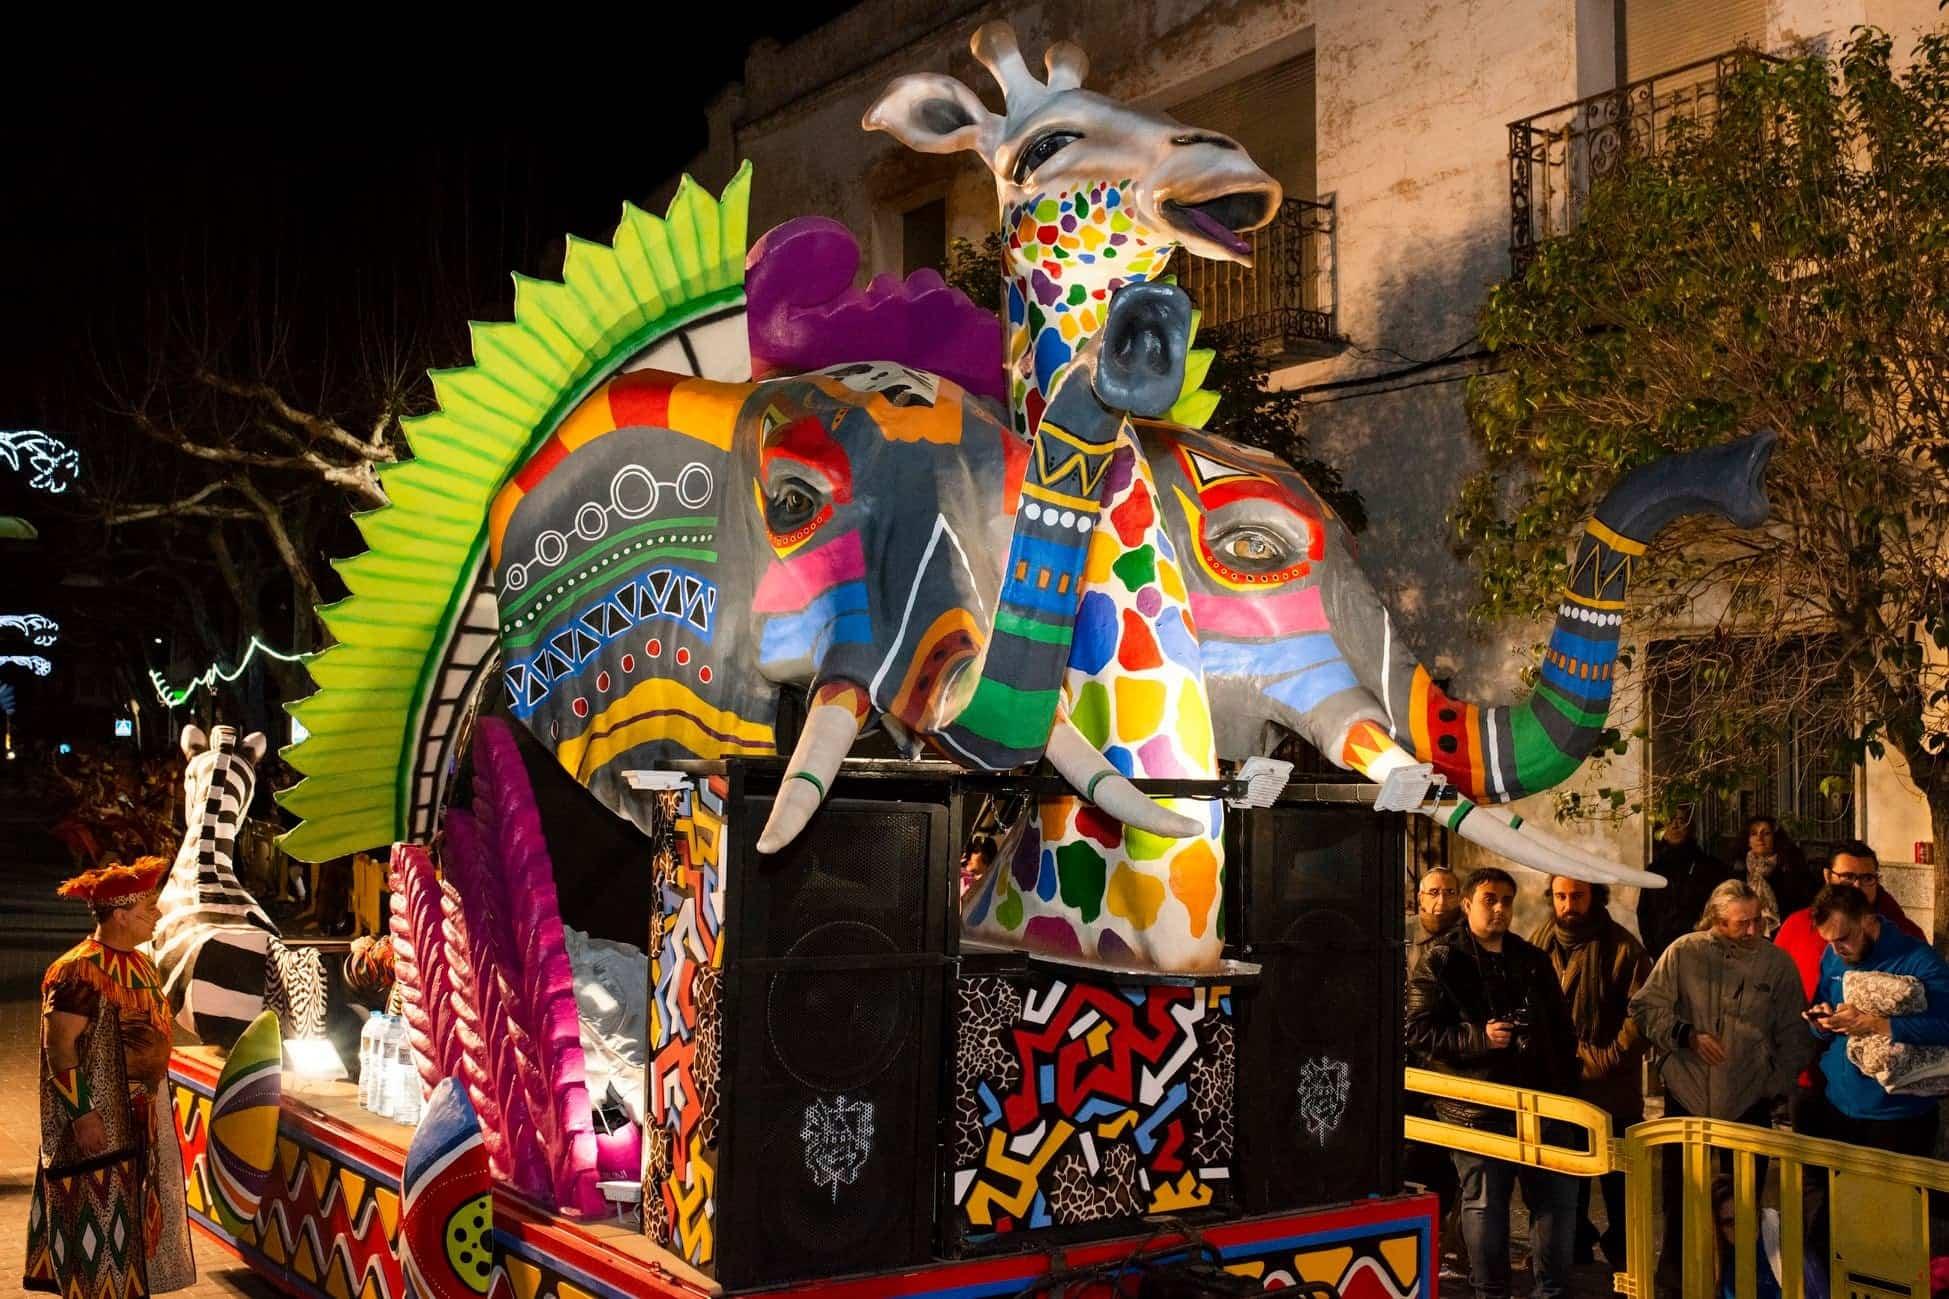 Carnaval de herencia 2020 ofertorio 139 - Selección de fotografías del Ofertorio del Carnaval de Herencia